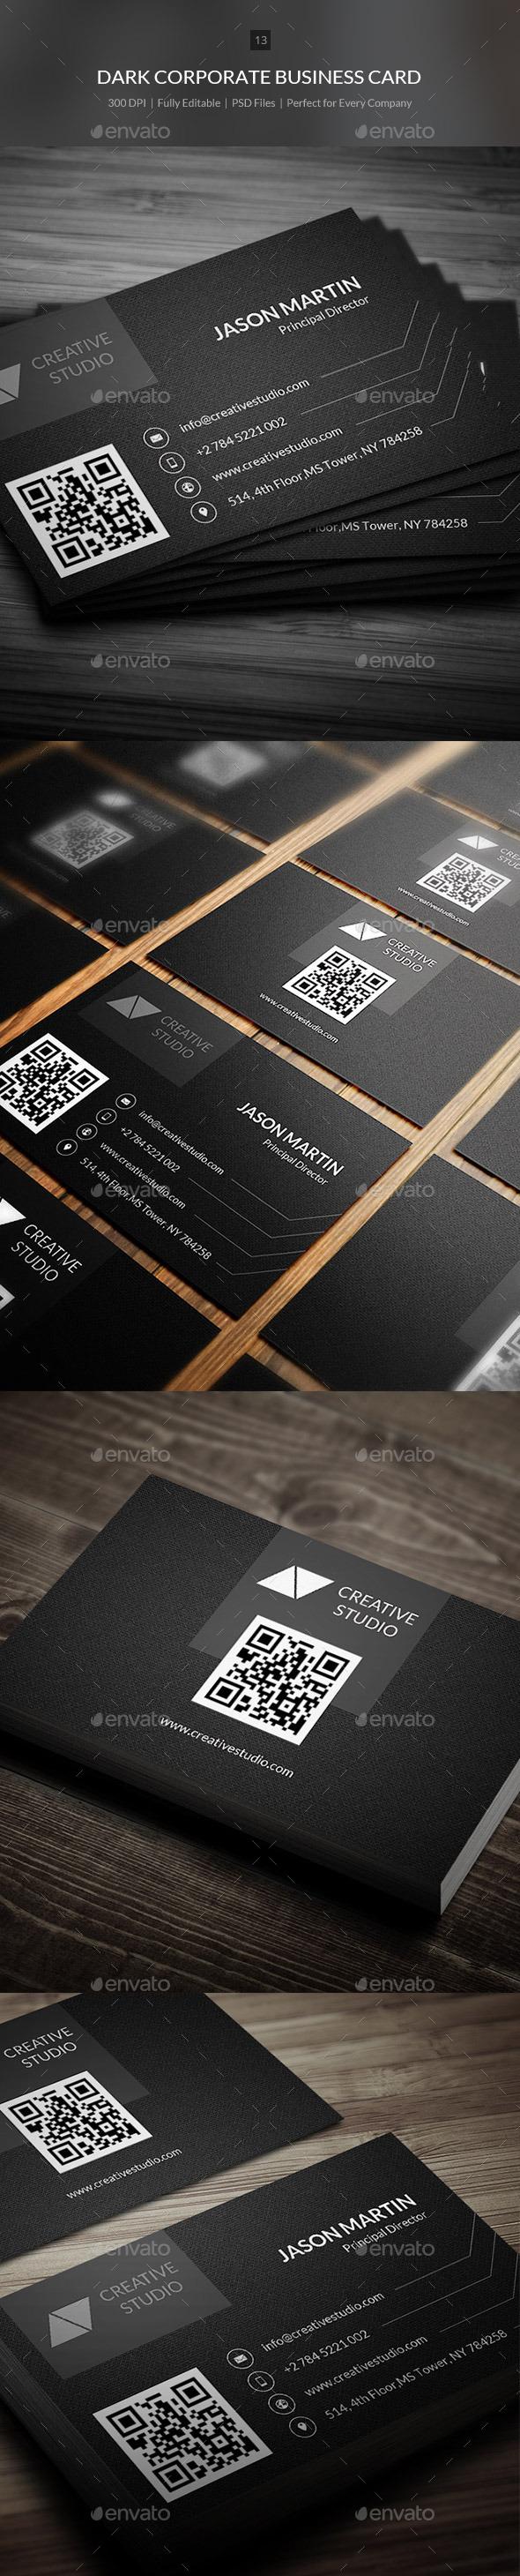 Dark Corporate Business Card - 13 - Corporate Business Cards